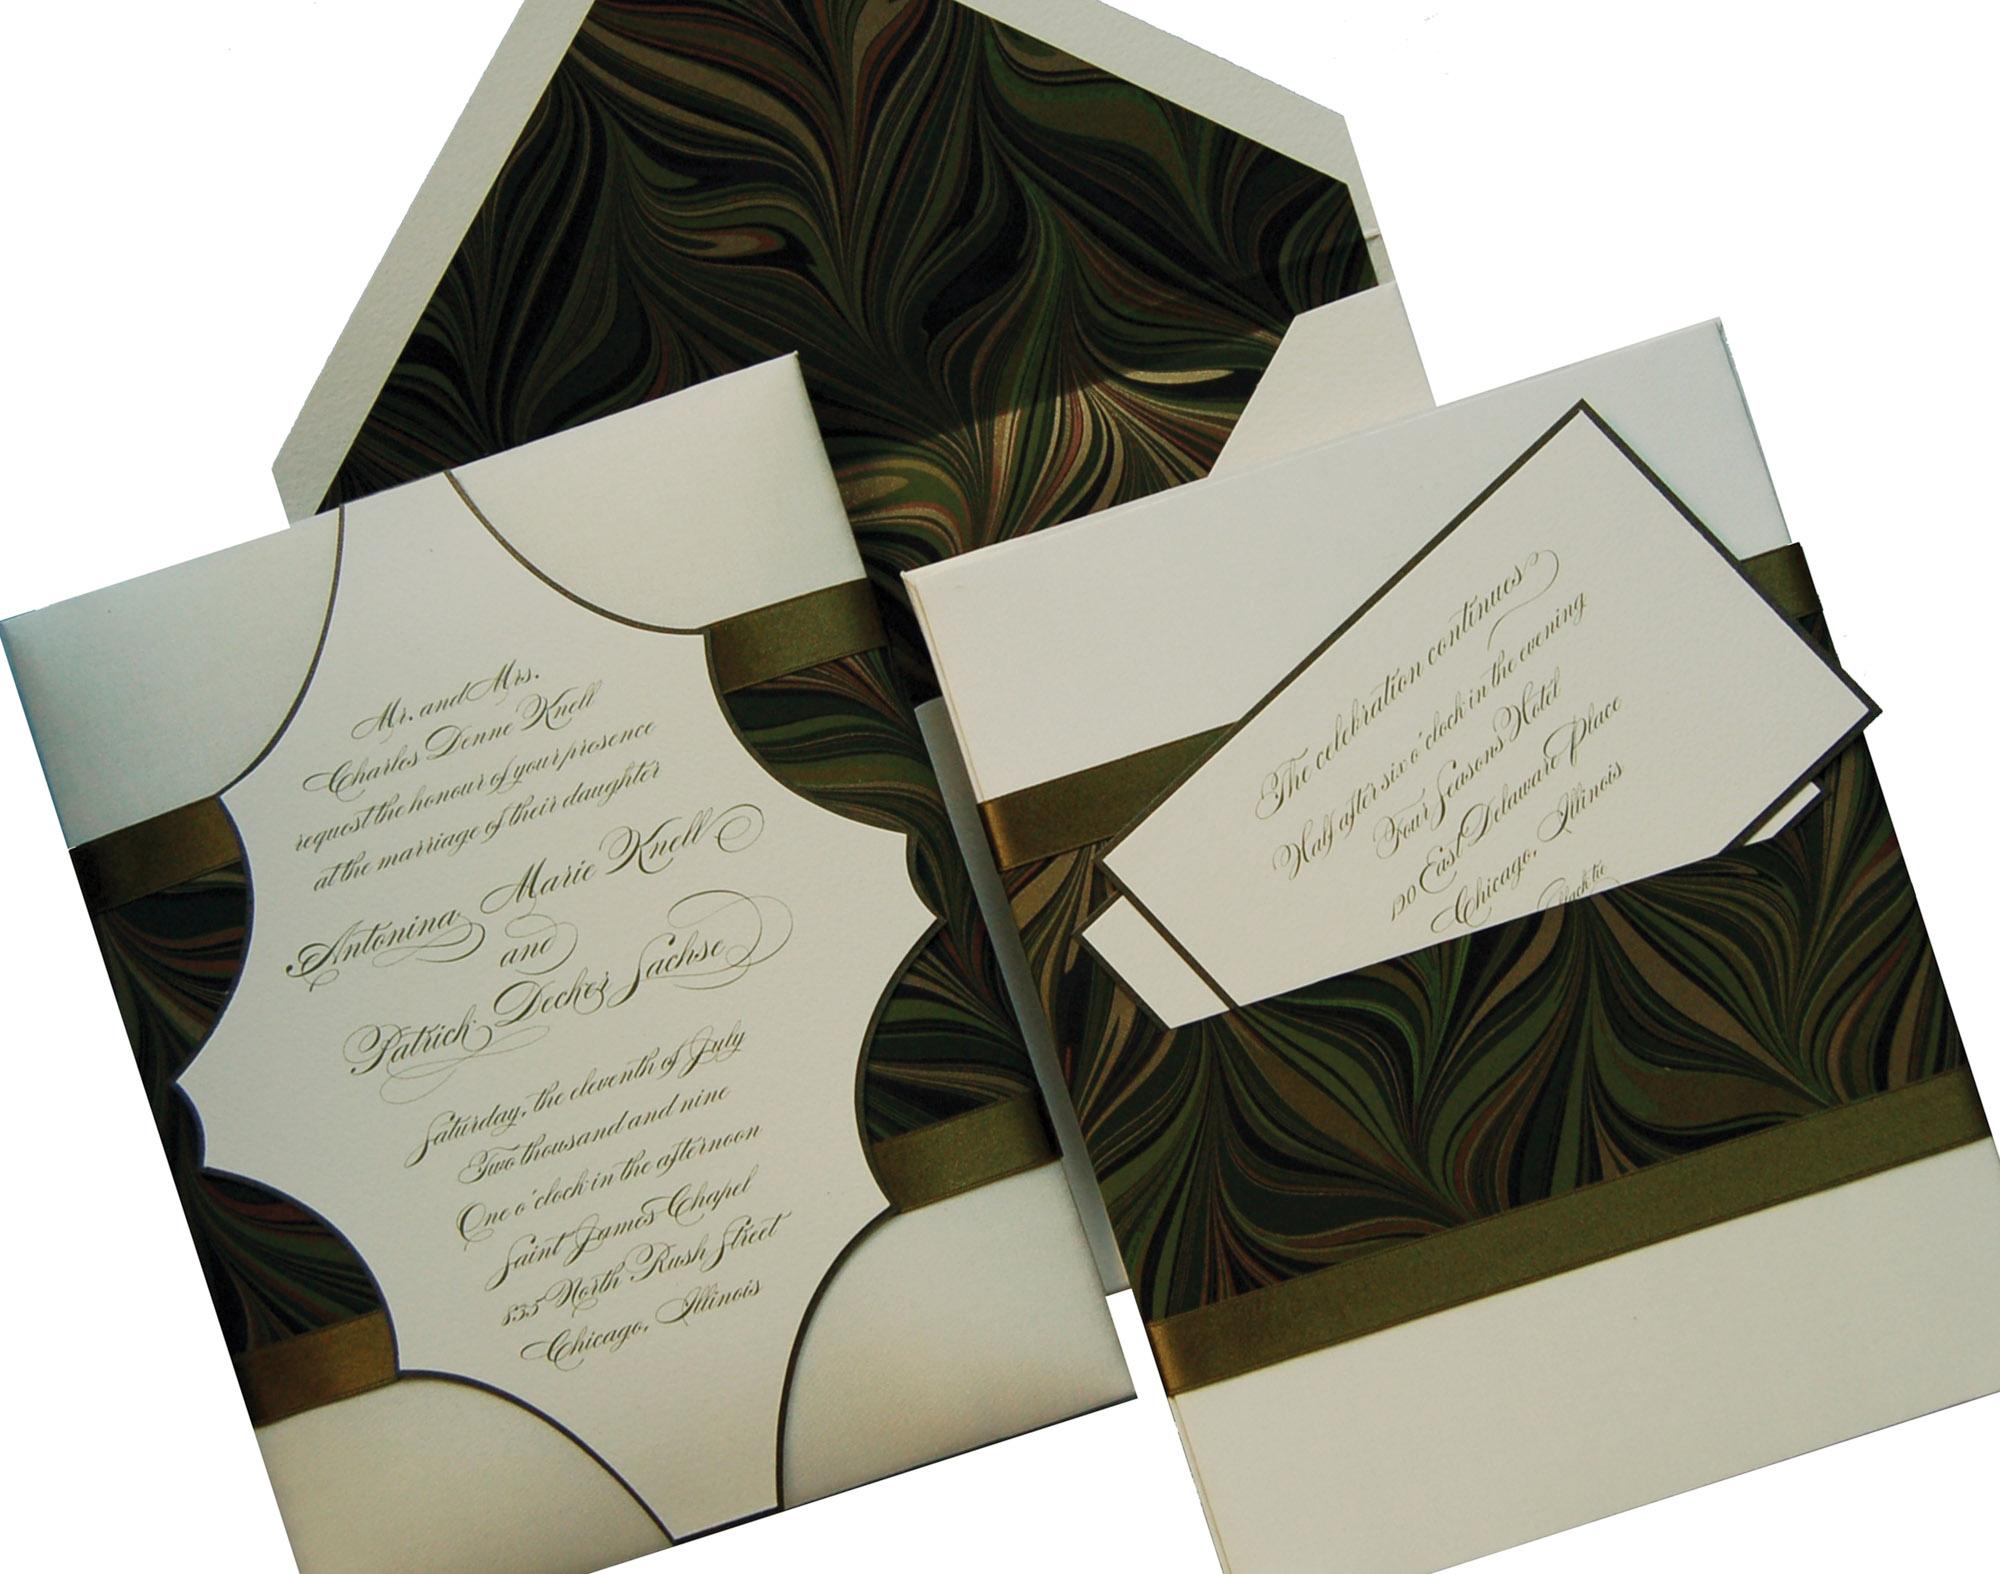 birch-bespoke-events-and-weddings-36.jpg